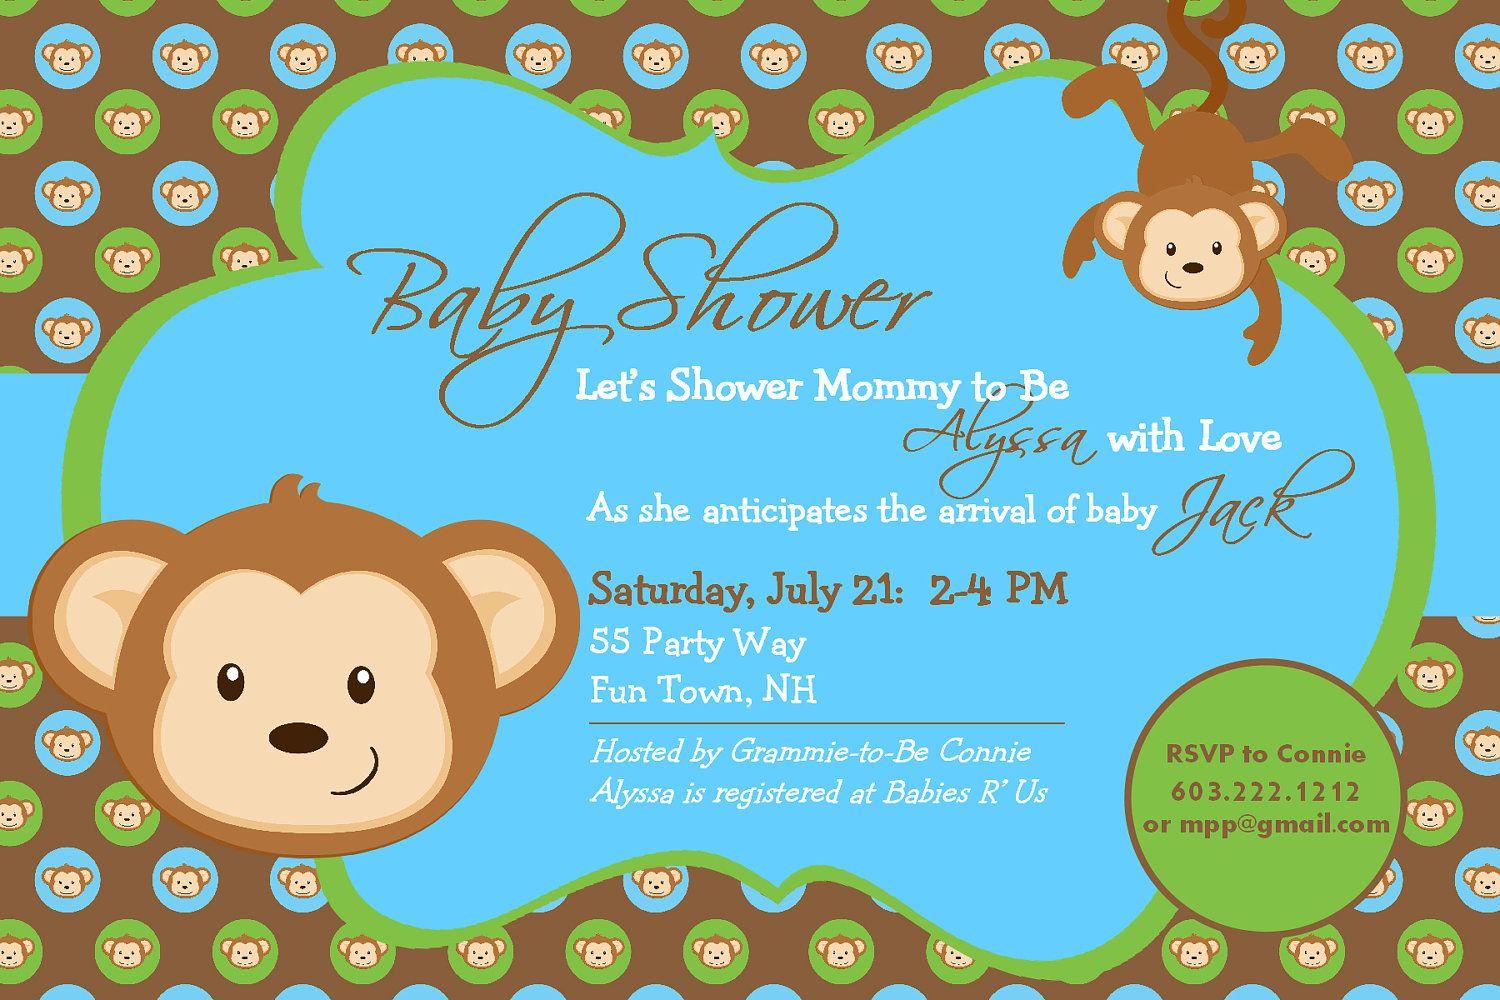 walmart baby shower invitations | baby shower invitation ideas, Baby shower invitations